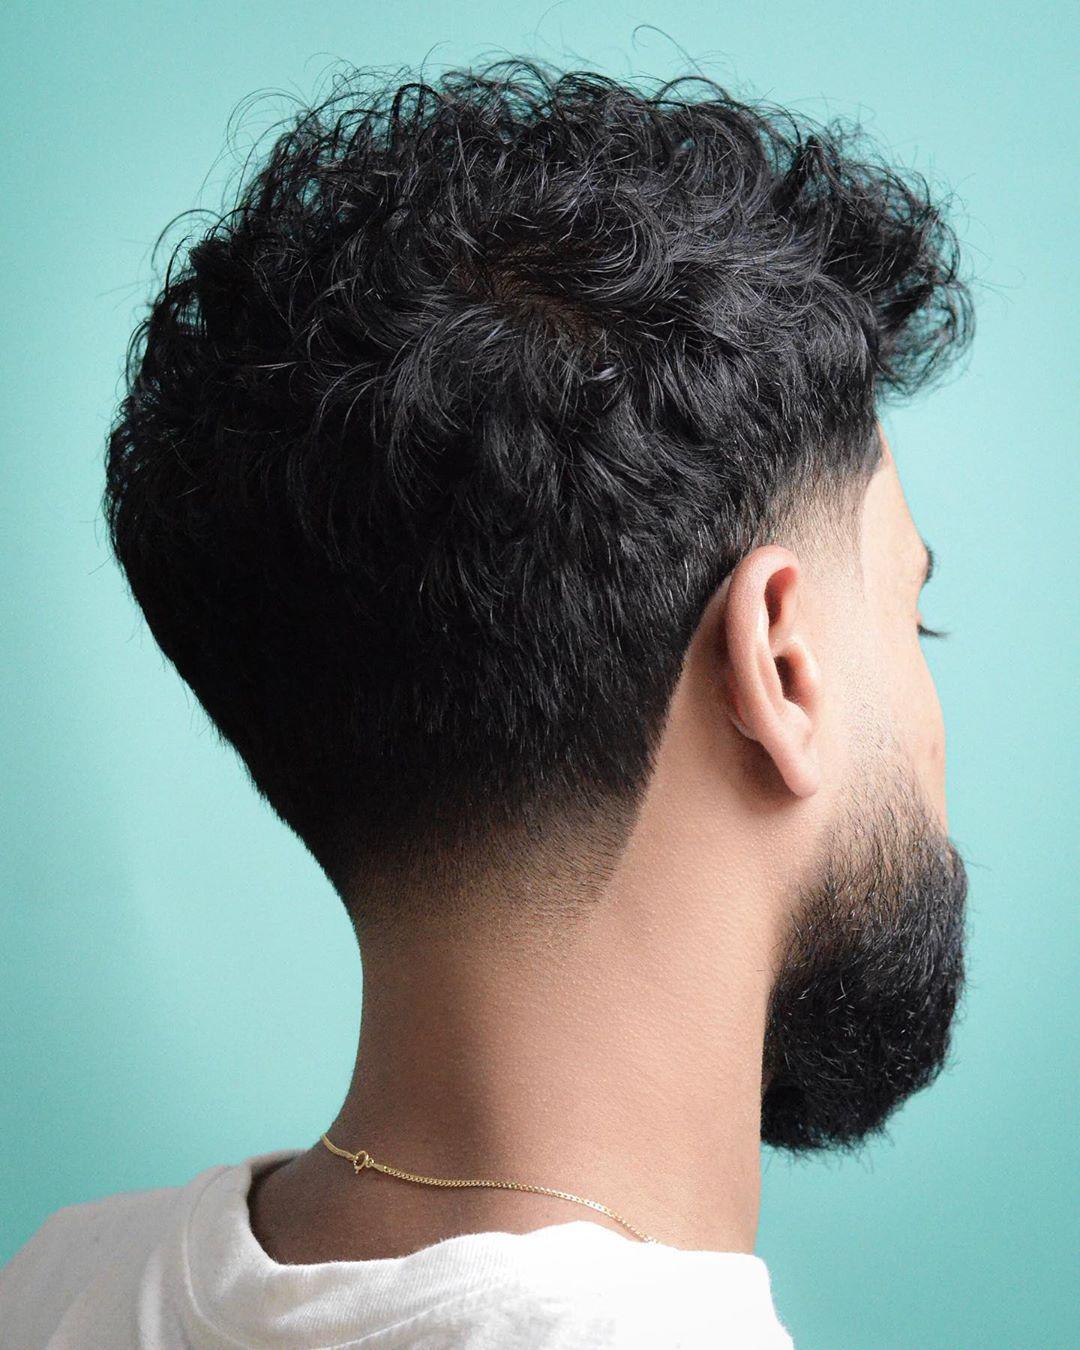 22 Modern Taper Fade Haircuts For Men 2020 Update In 2020 Mens Haircuts Fade Fade Haircut Taper Fade Haircut